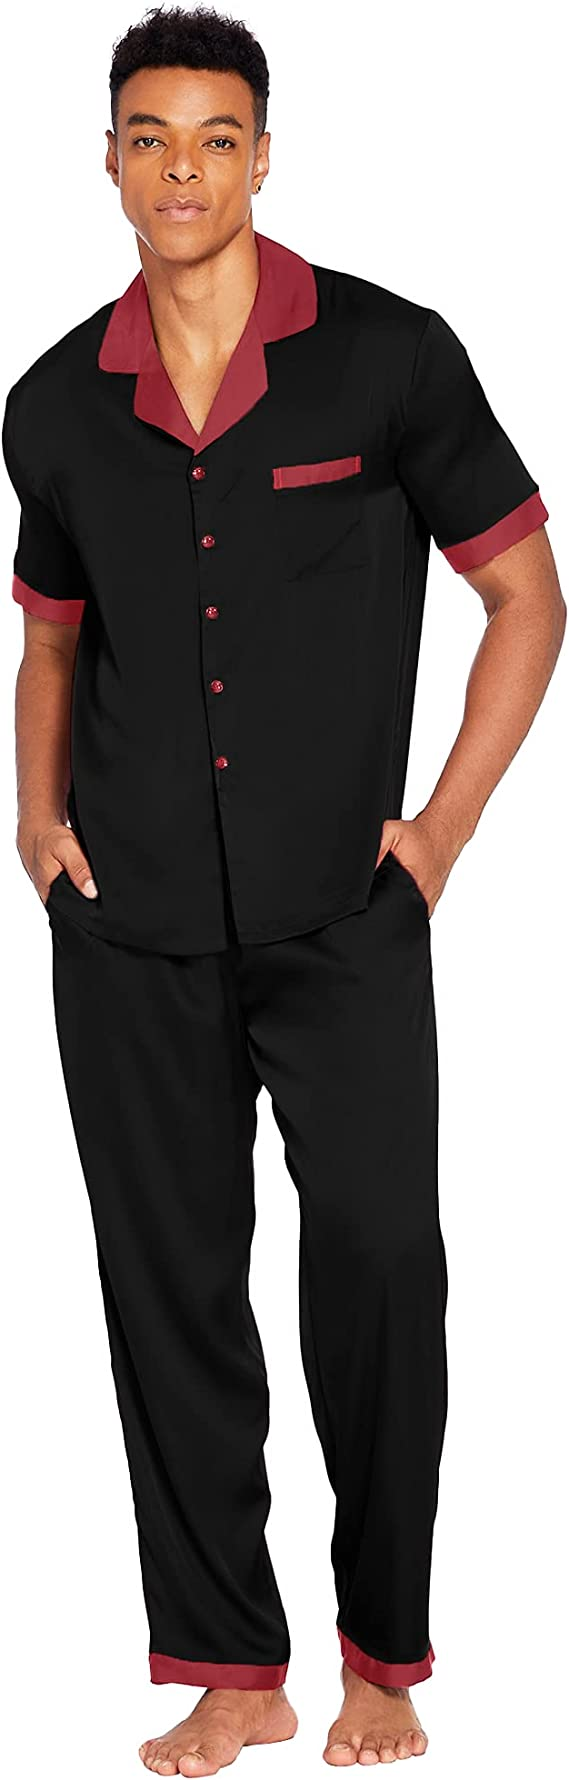 Ekouaer Men Silk Satin Pajamas Set Short Sleeve Button Down Sleepwear with Long Pants Silky Pjs Notch Collar Loungewear S-XXL